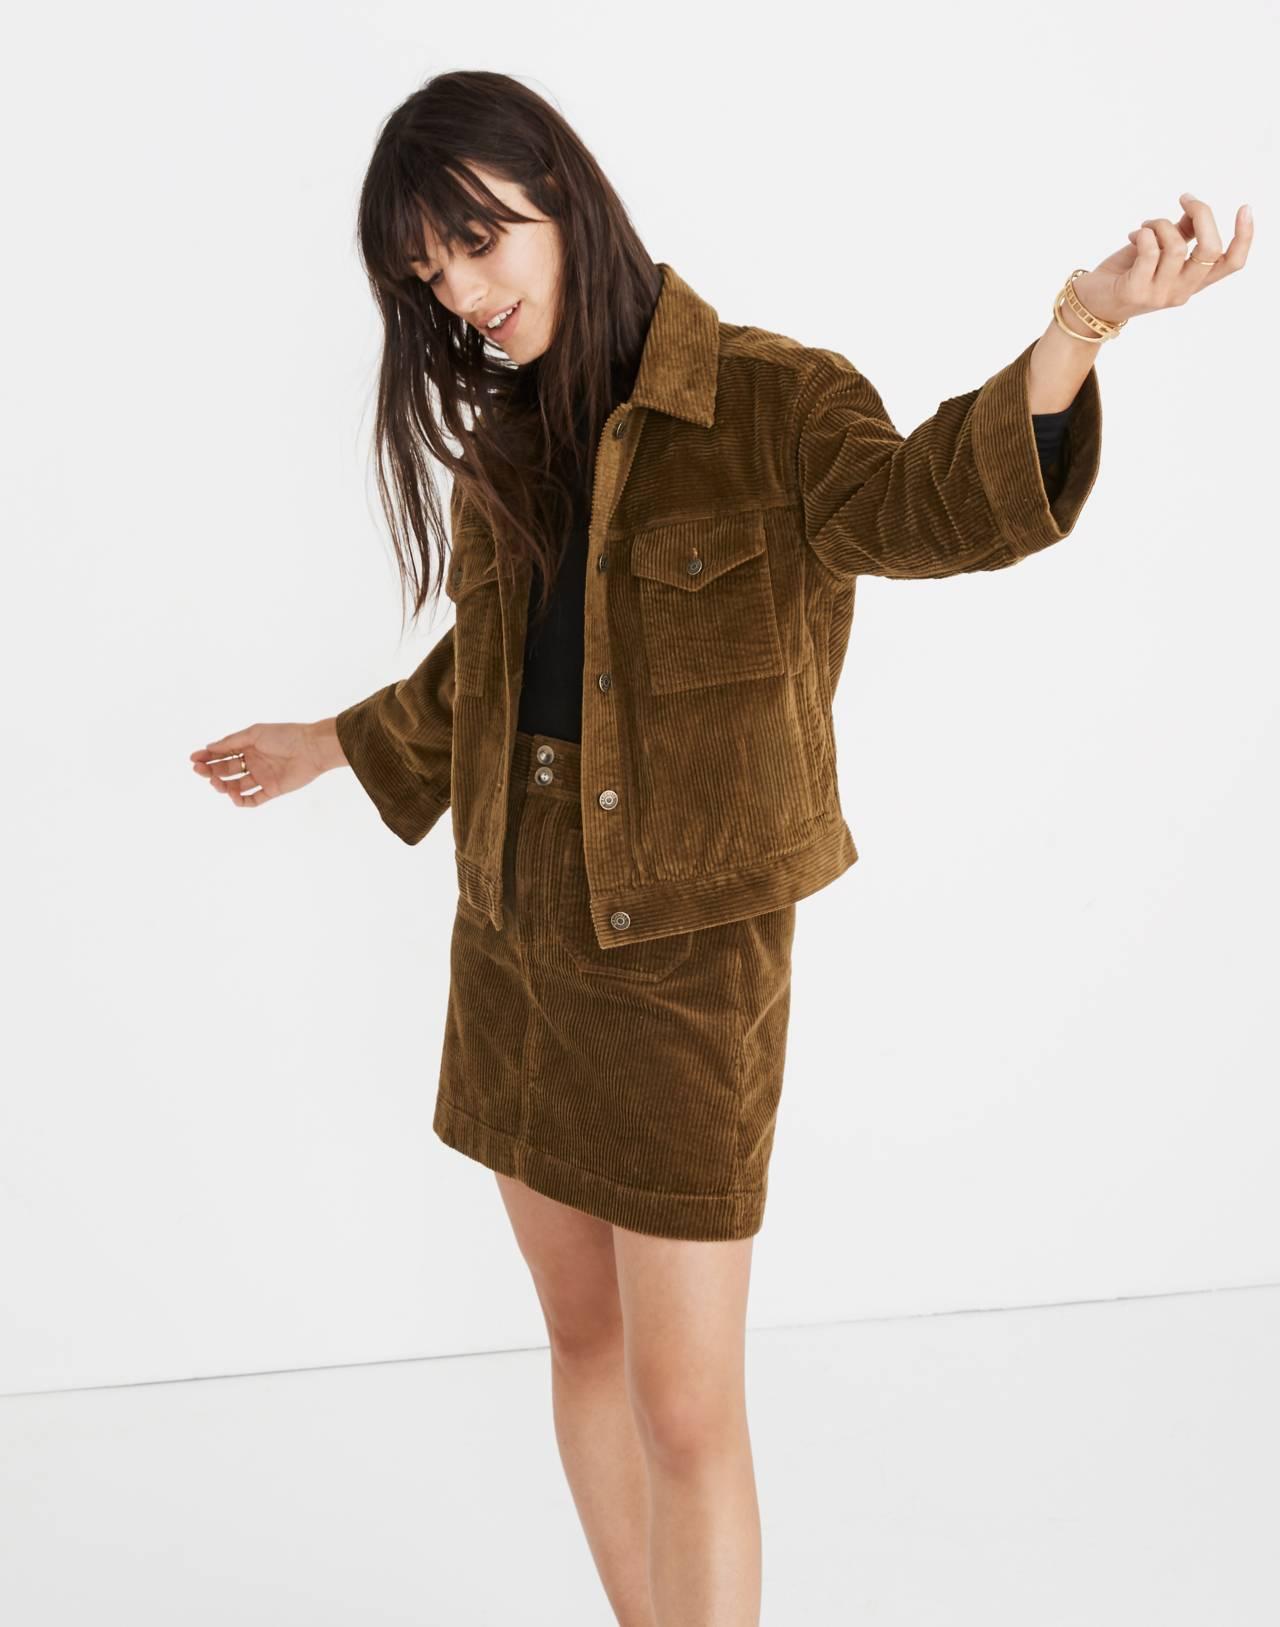 Corduroy A-Line Mini Skirt in asparagus image 2